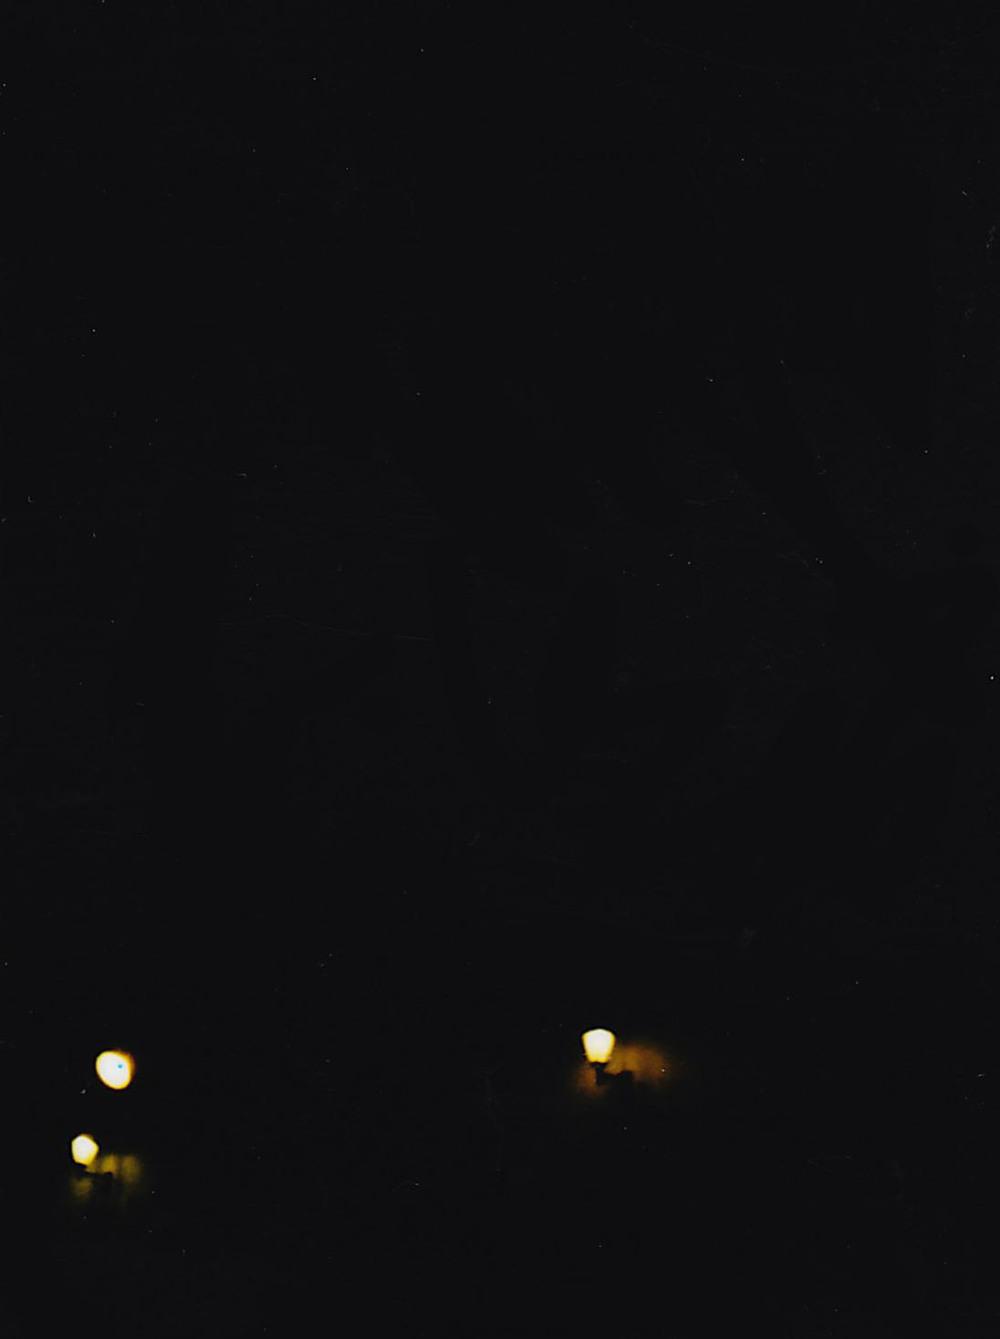 Mini8_2016_Cartagena_Lights_0006_layer 3.jpg